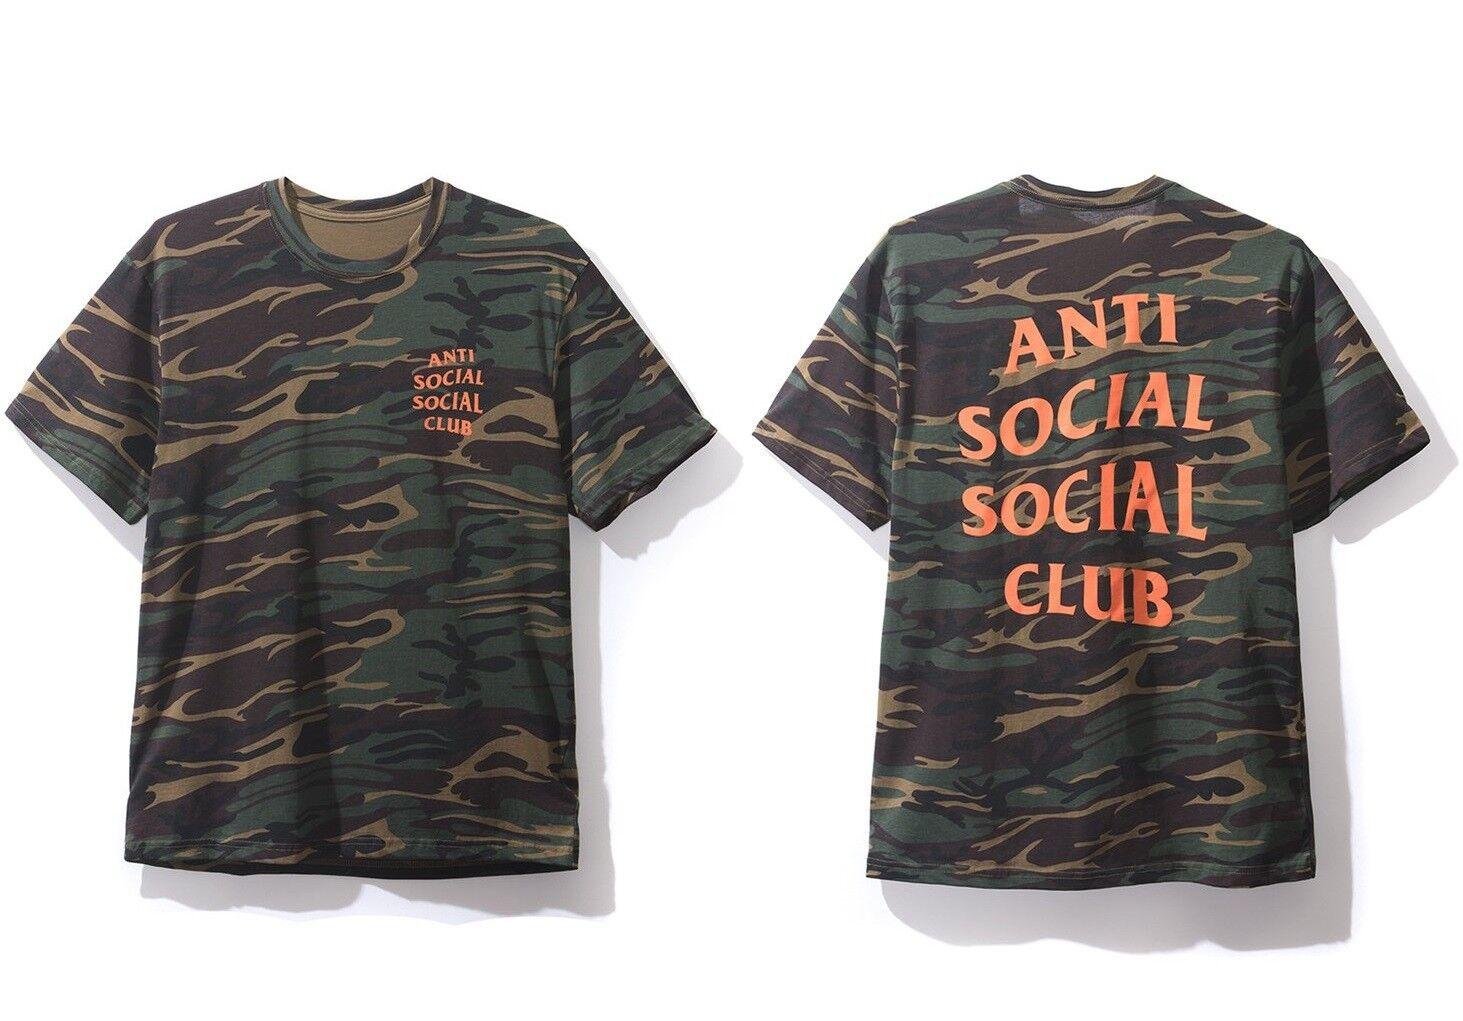 DS Anti Social Social Club ASSC orange Logo Green Ghost Camo Tee Shirt in hand